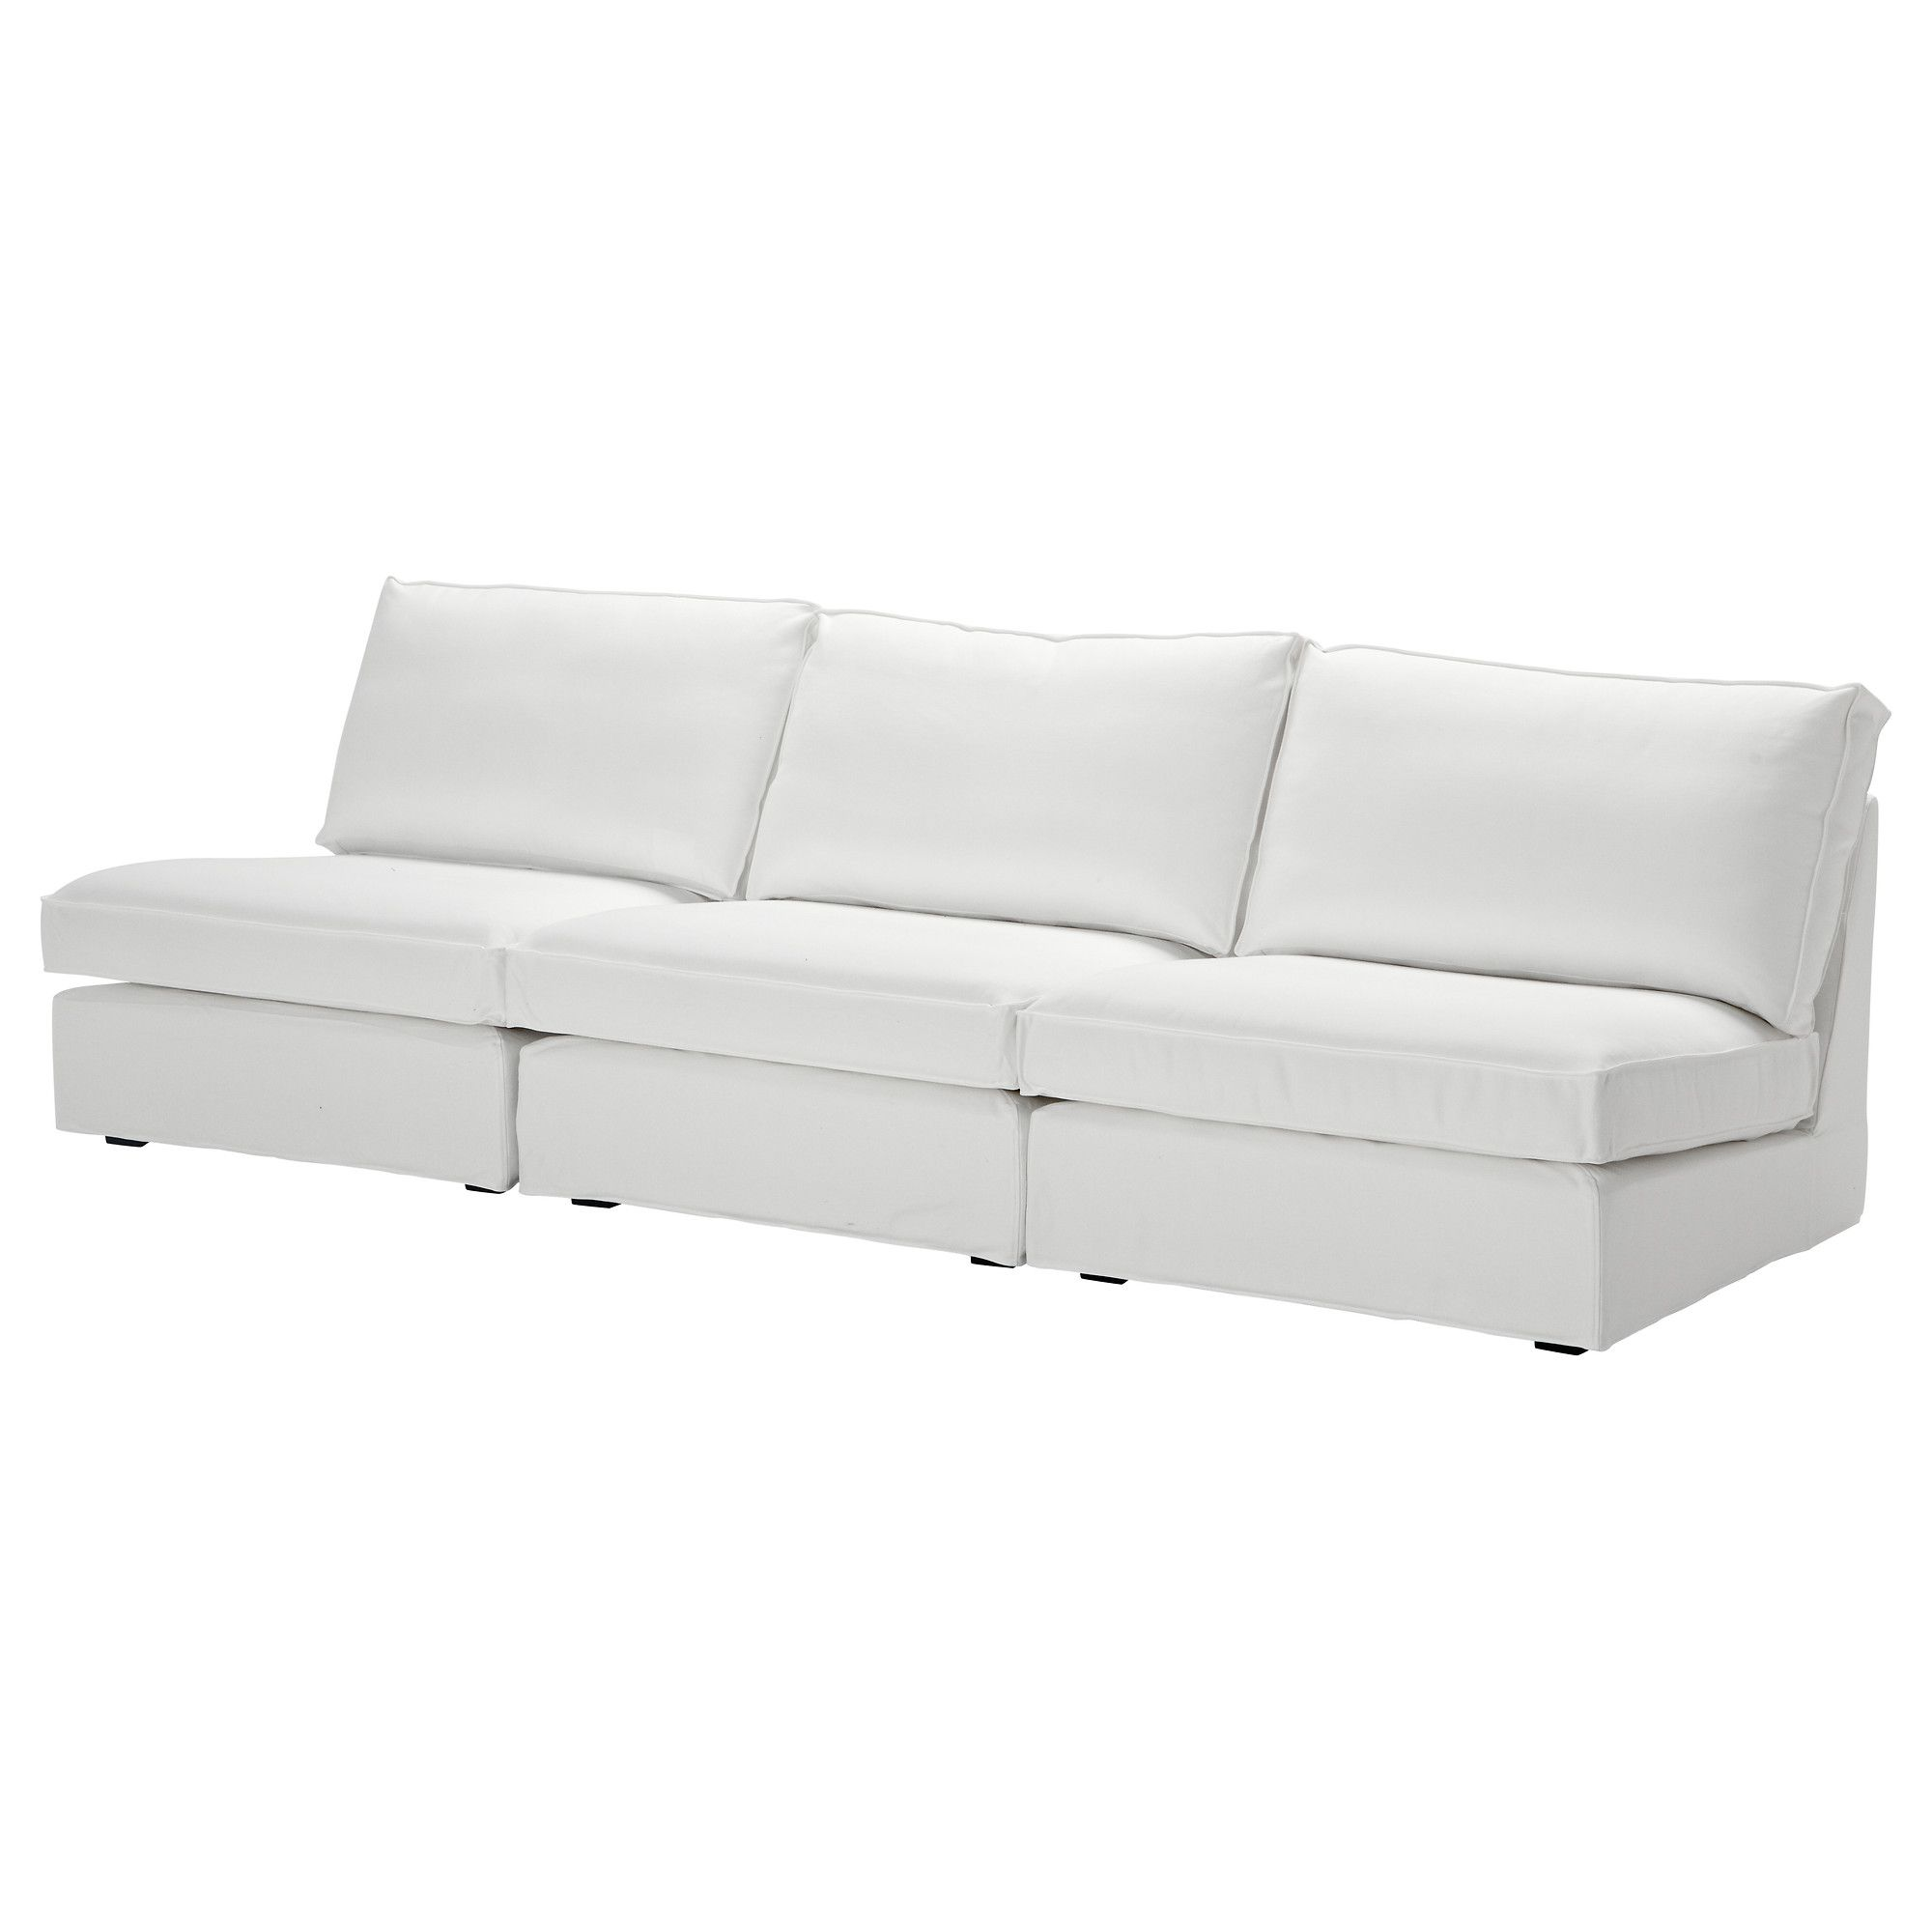 KIVIK 3er-Polstergruppe - Blekinge weiß - IKEA